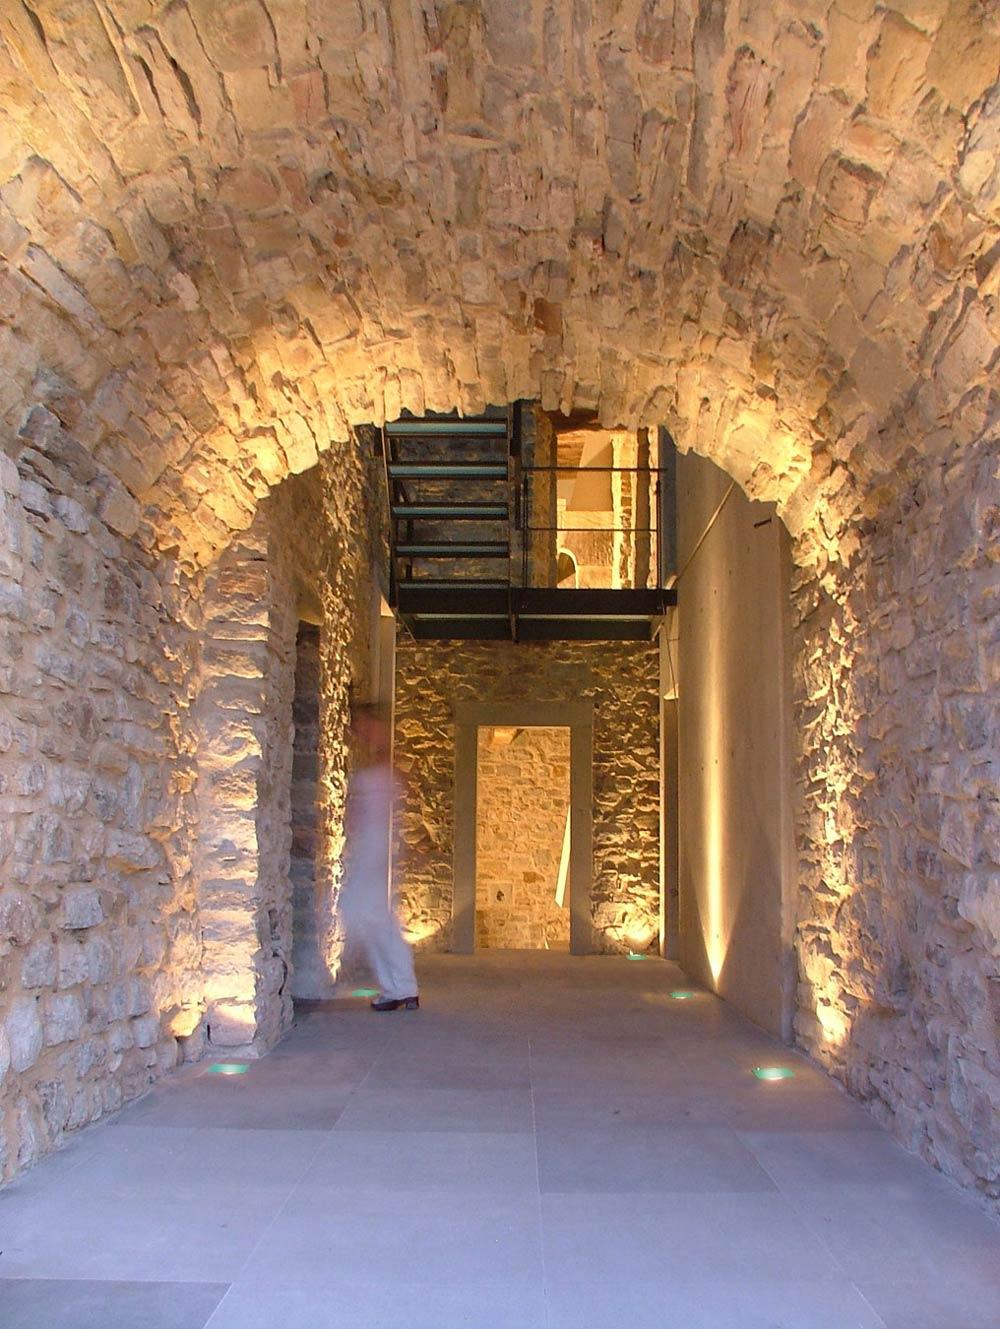 Stone Arch, Hallway, Torre Moravola Boutique Hotel in Montone, Italy